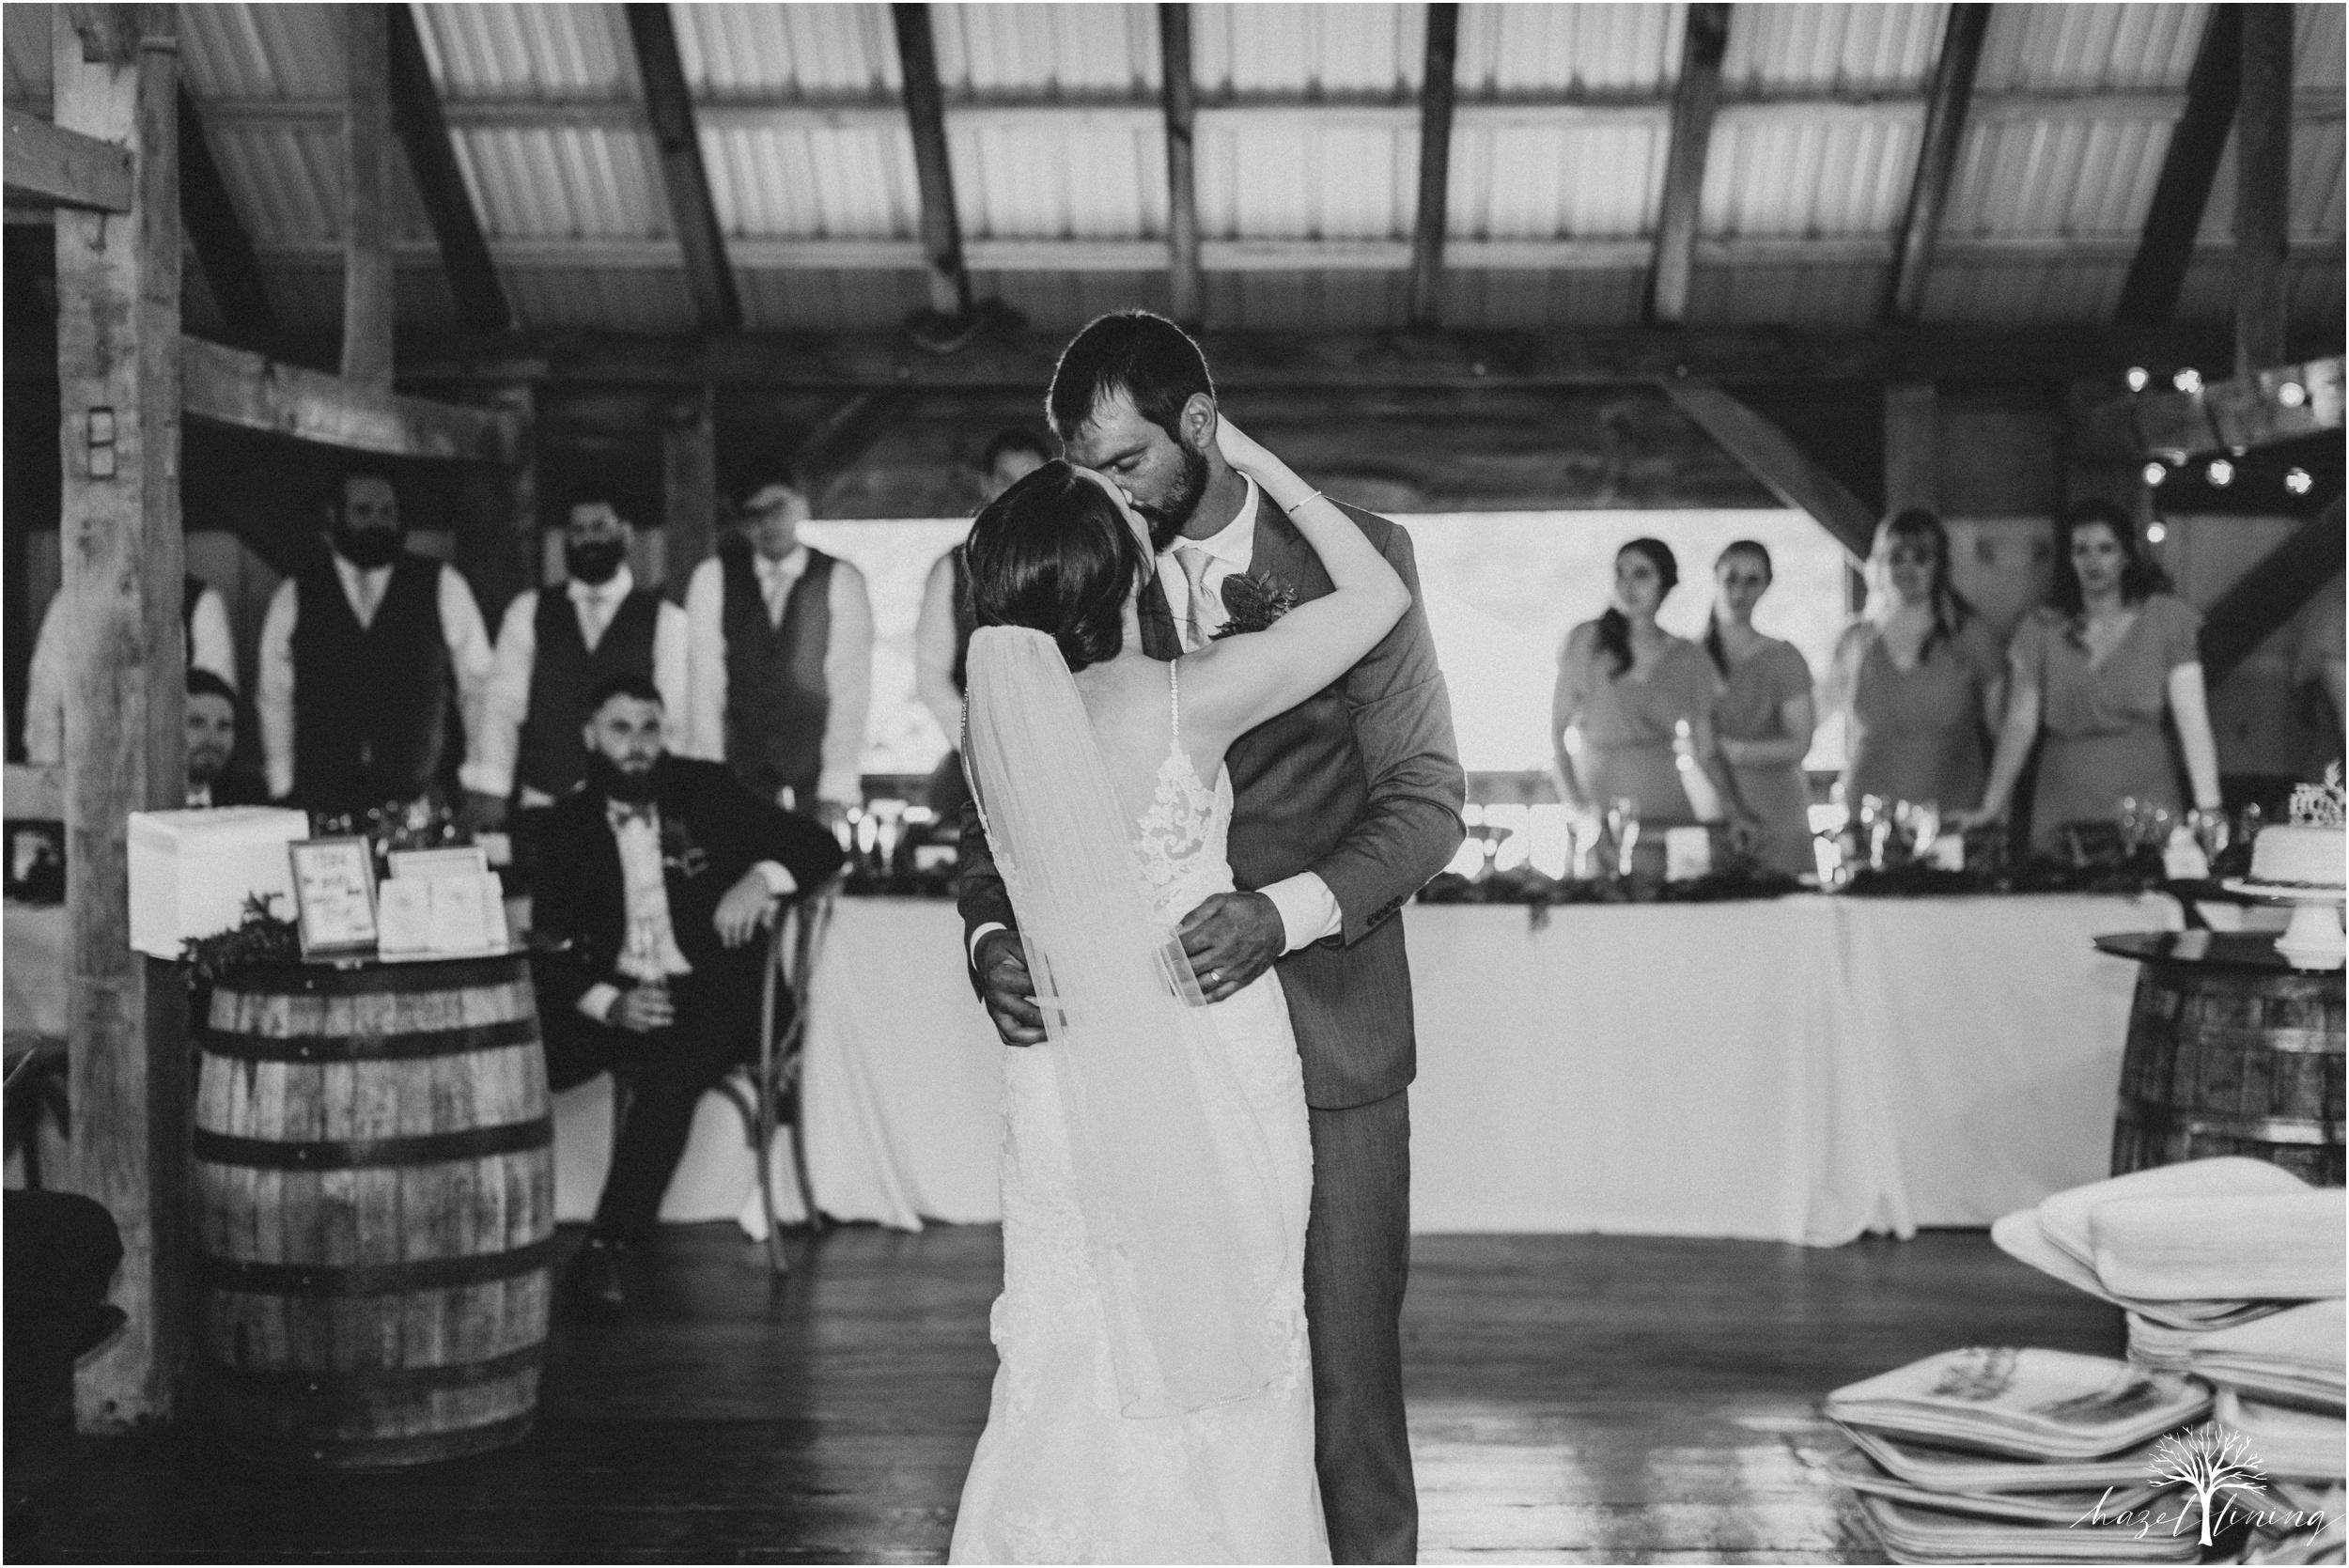 hazel-lining-travel-wedding-elopement-photography-lisa-landon-shoemaker-the-farm-bakery-and-events-bucks-county-quakertown-pennsylvania-summer-country-outdoor-farm-wedding_0116.jpg